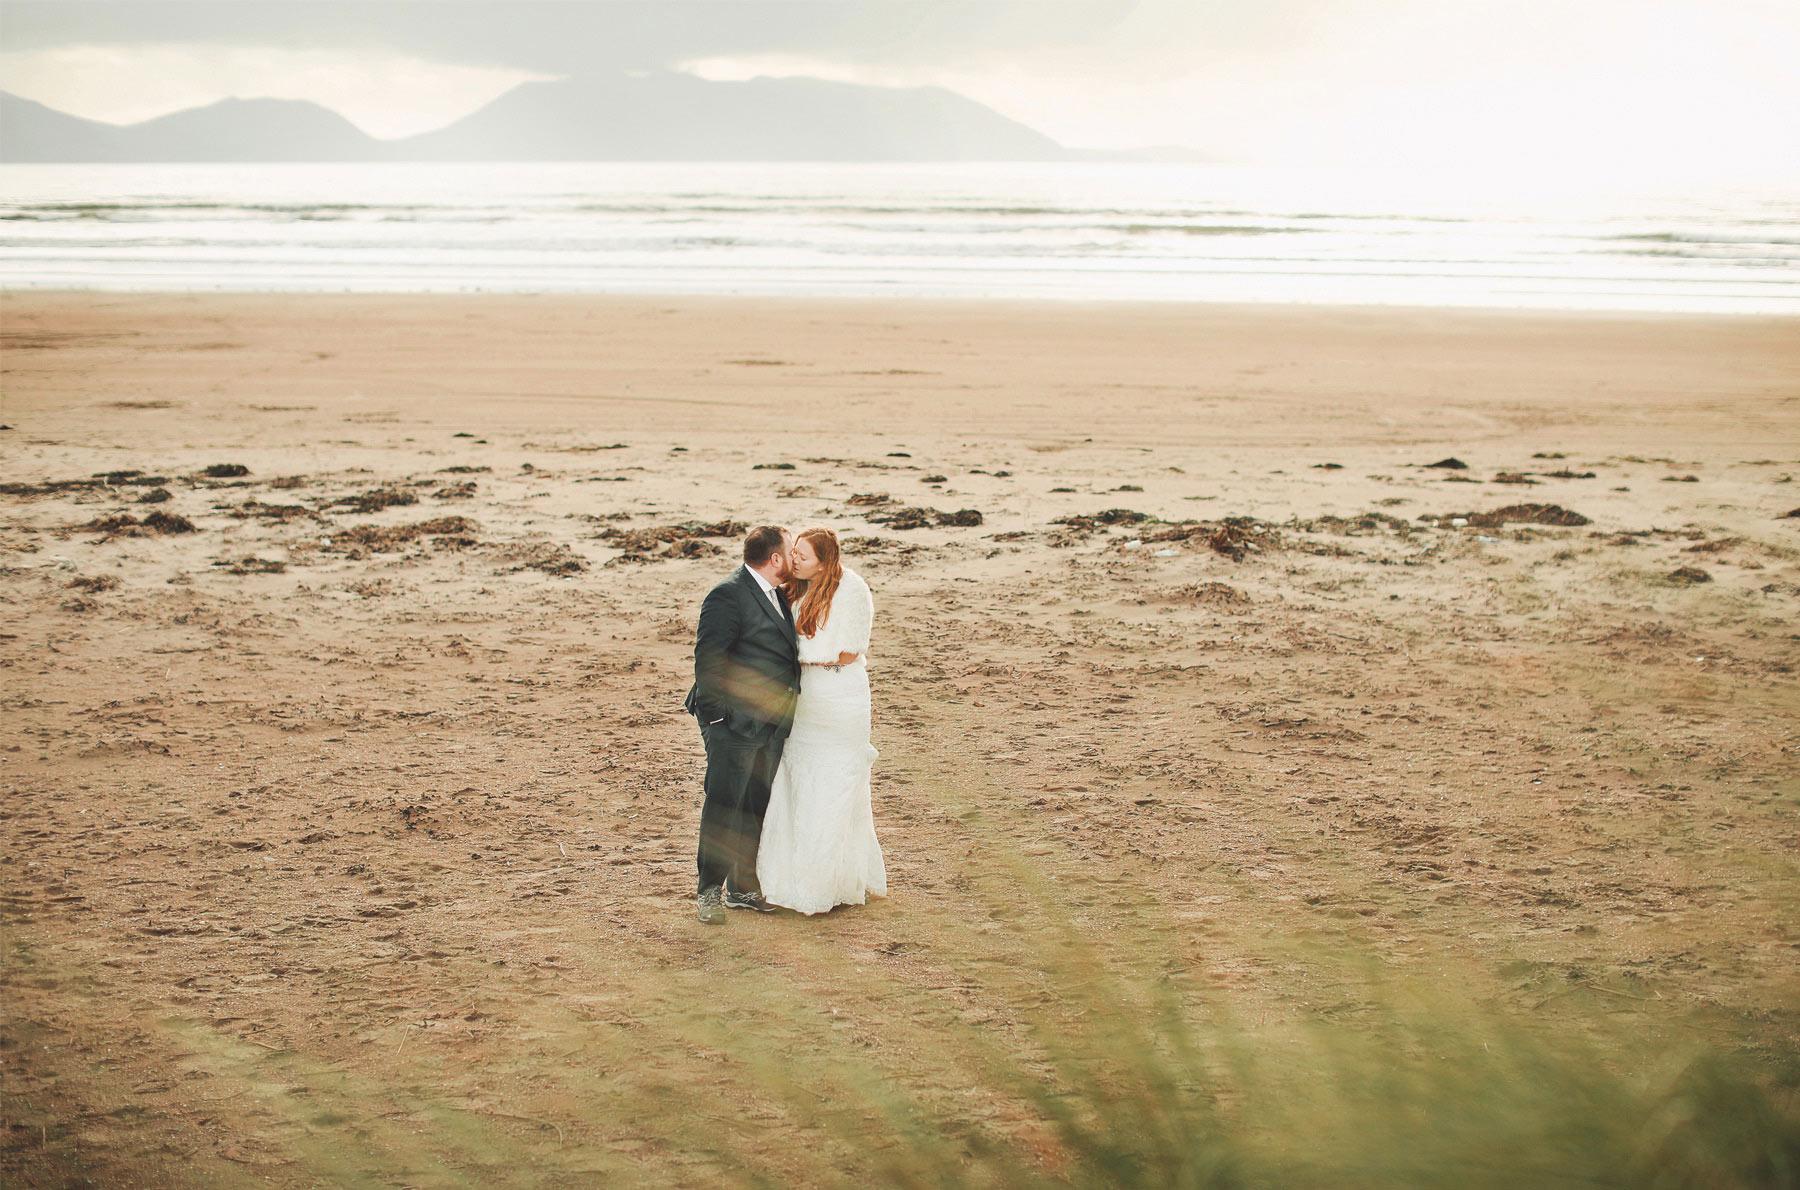 08-Kilarney-Ireland-Wedding-Photographer-by-Andrew-Vick-Photography-Fall-Autumn-Destination-Bride-Groom-Ocean-Beach-Kiss-Vintage-Becca-and-Donal.jpg